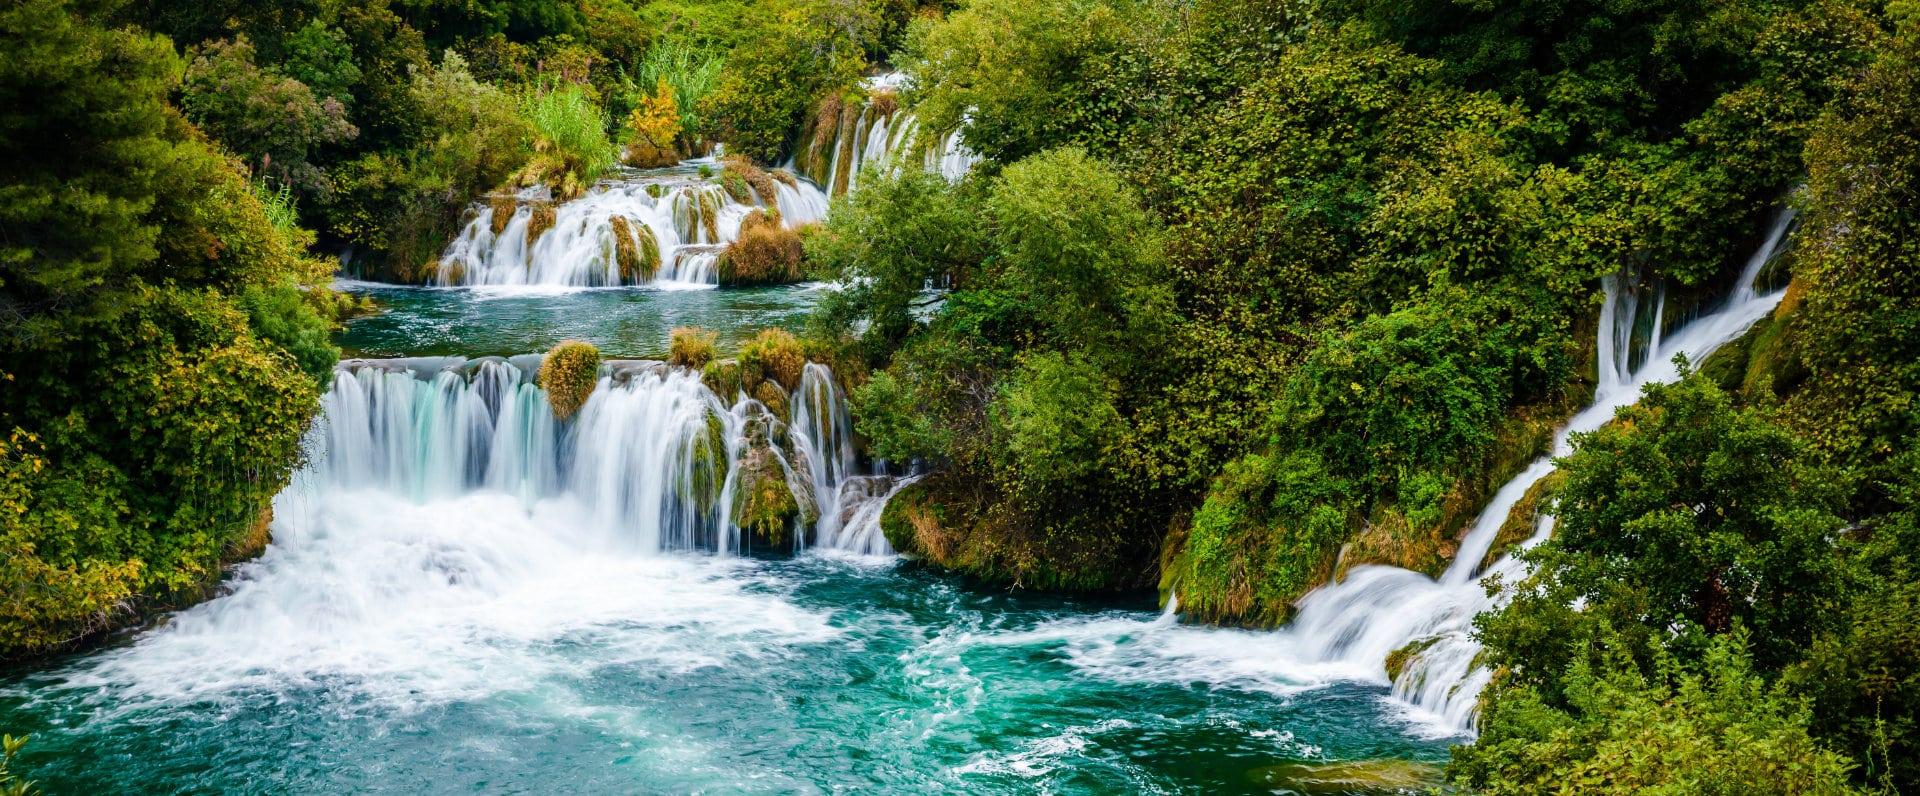 Excursion Dalmatia